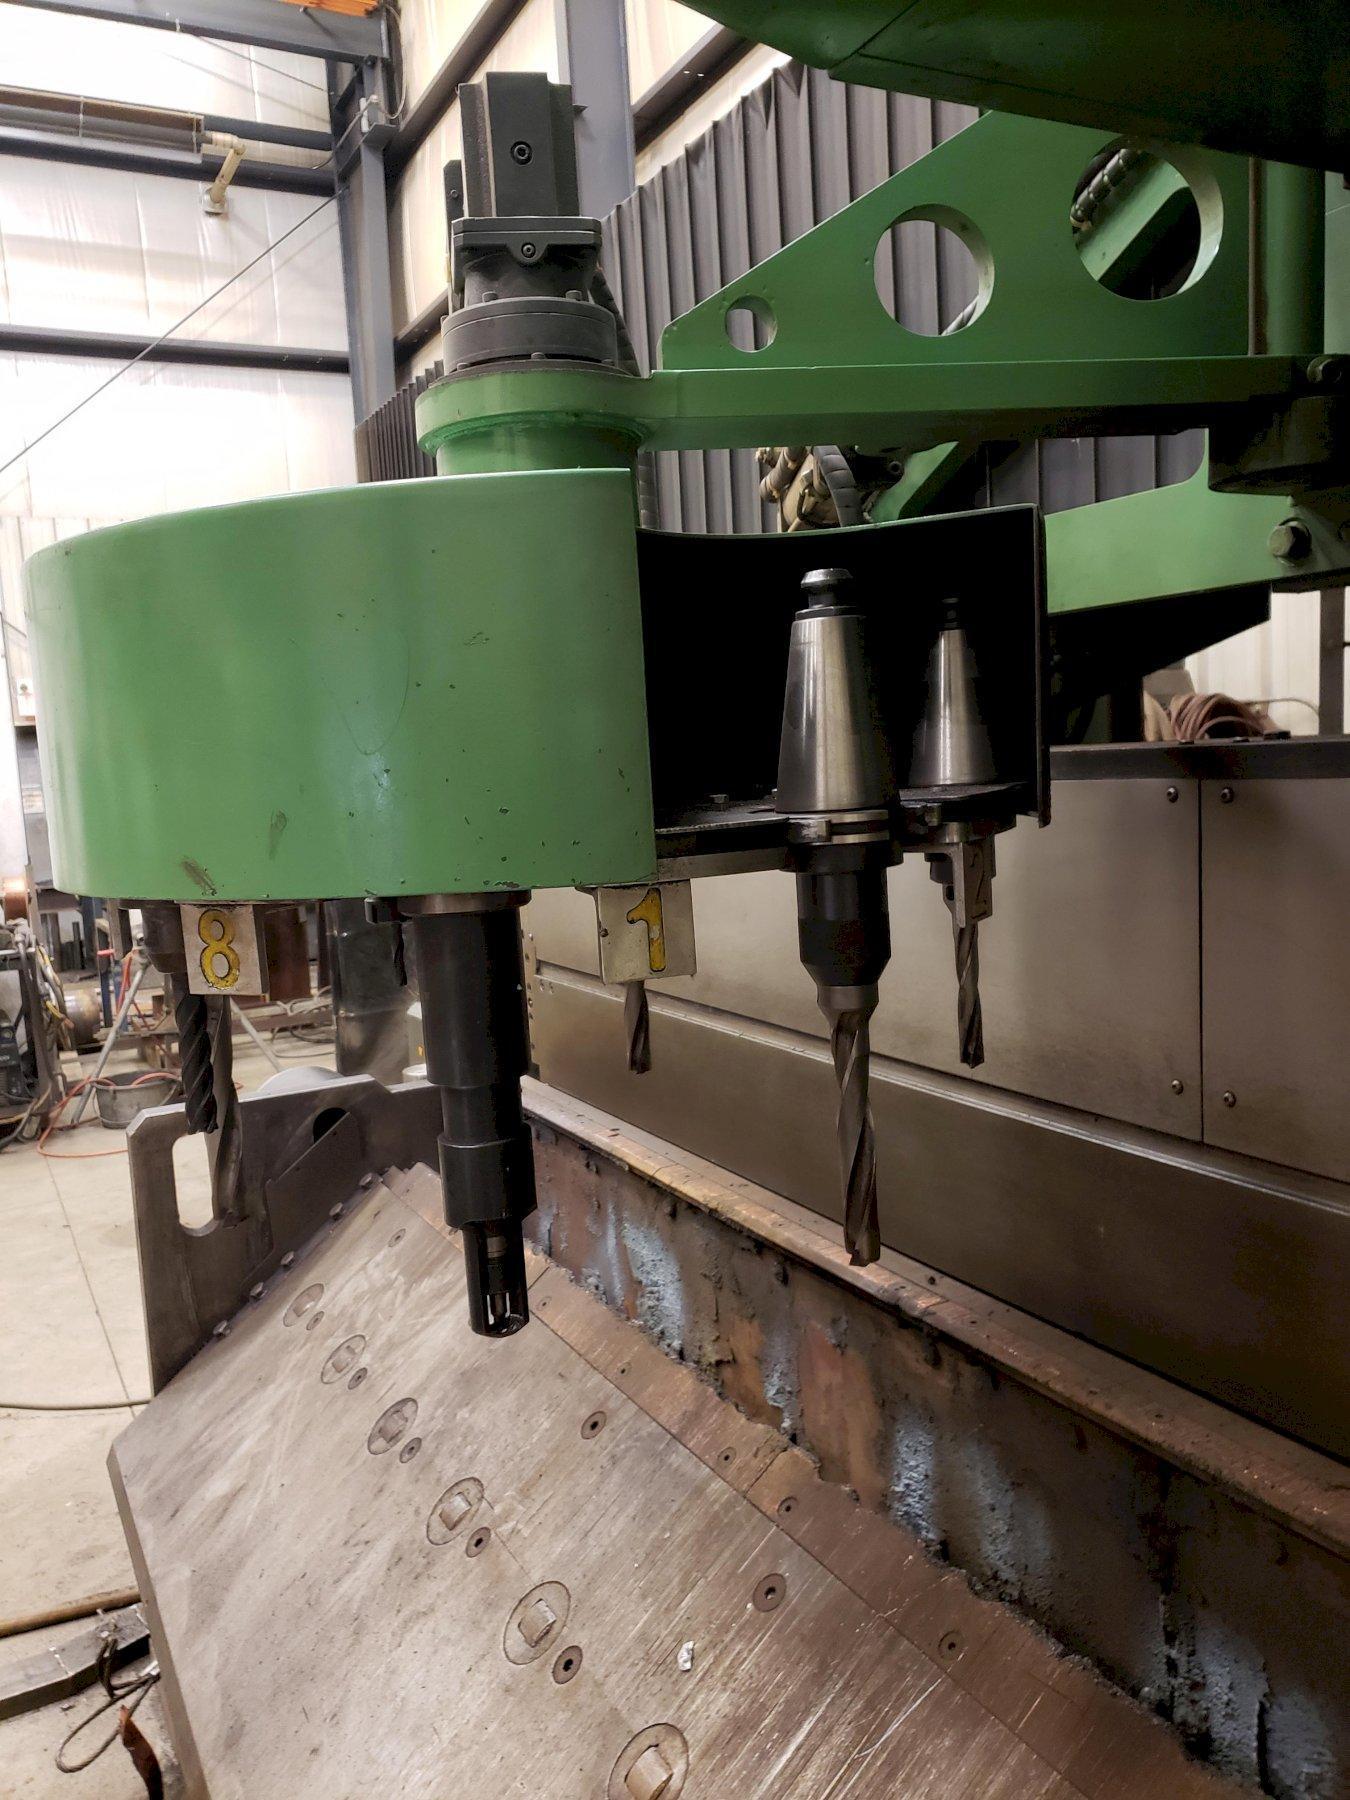 PEDDINGHAUS HSFDB 2500-B DRILL/PLASMA PLATE PROCESSING MACHINE. STOCK # 0104621